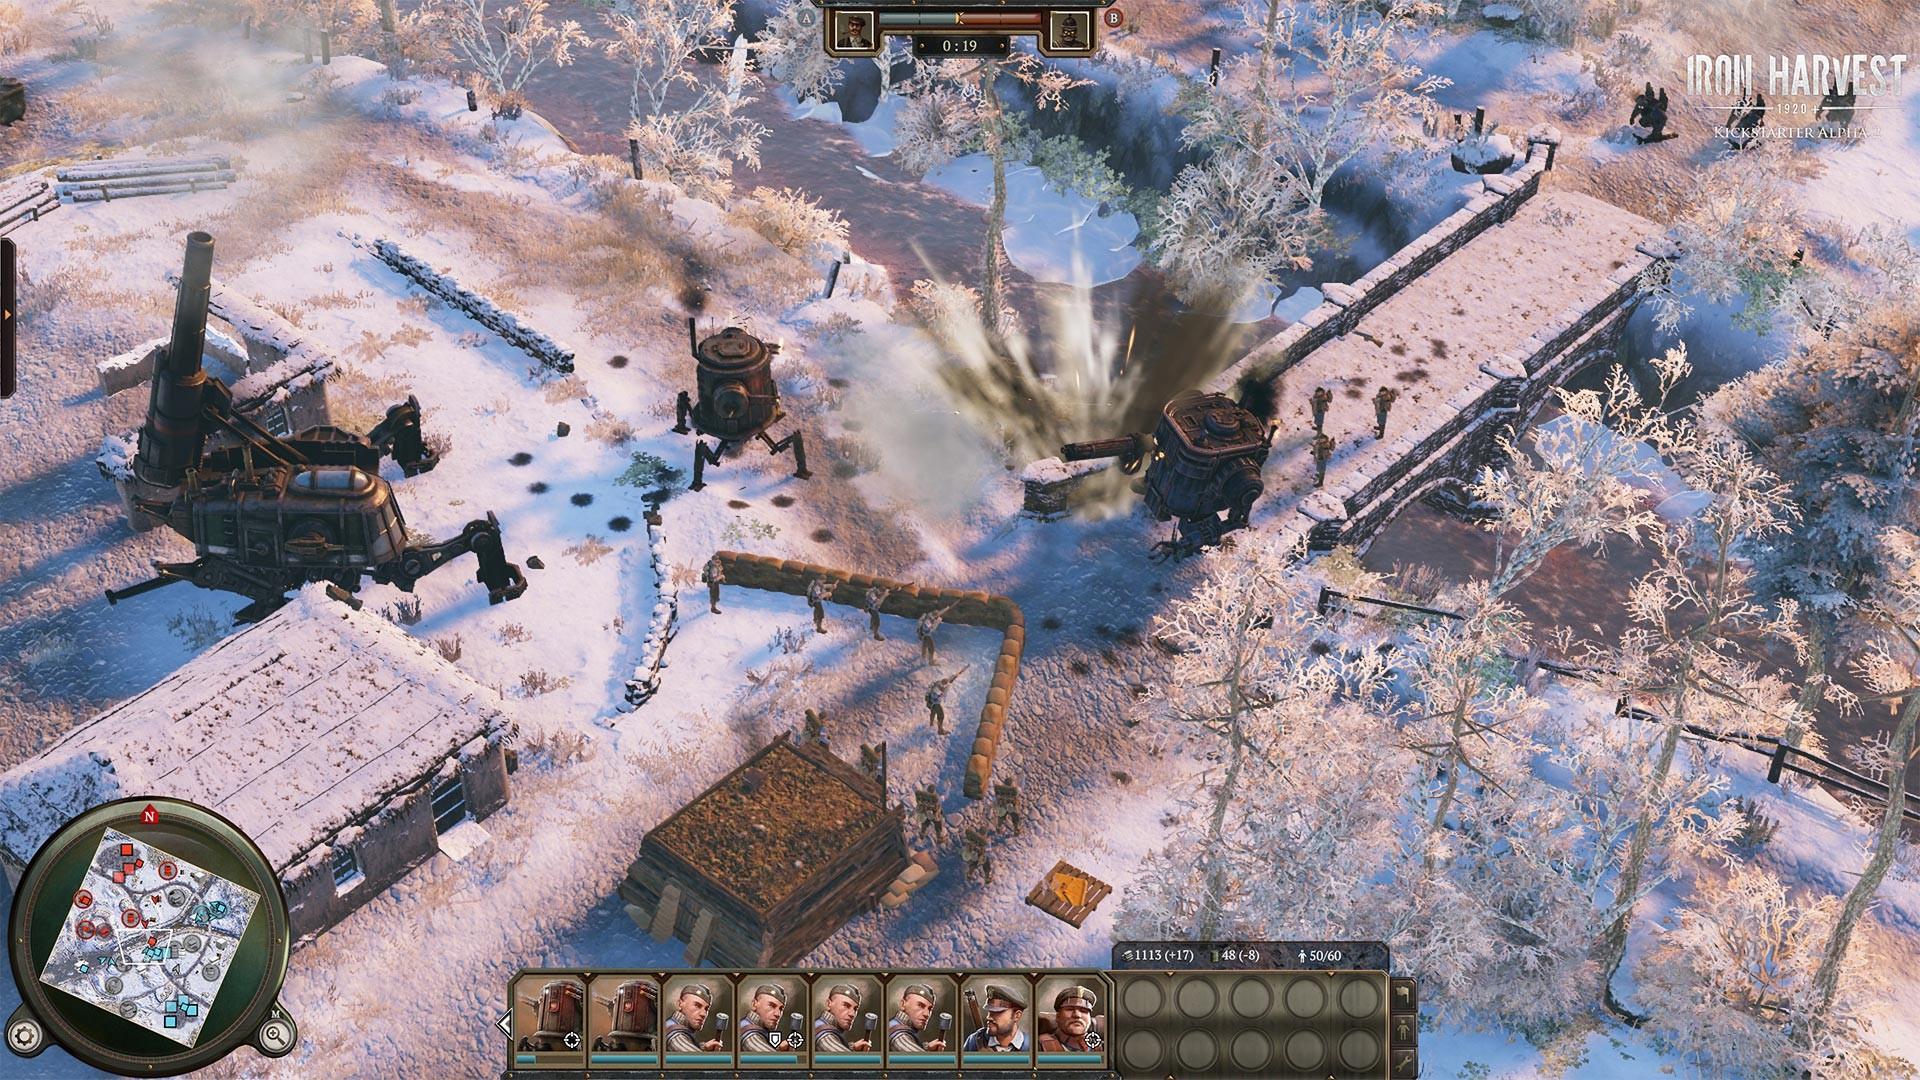 Screenshot for the game Iron Harvest (v.1.1.0.1916 rev 43270 (43500) +DLC) (2020) download torrent RePack from R. G. Mechanics